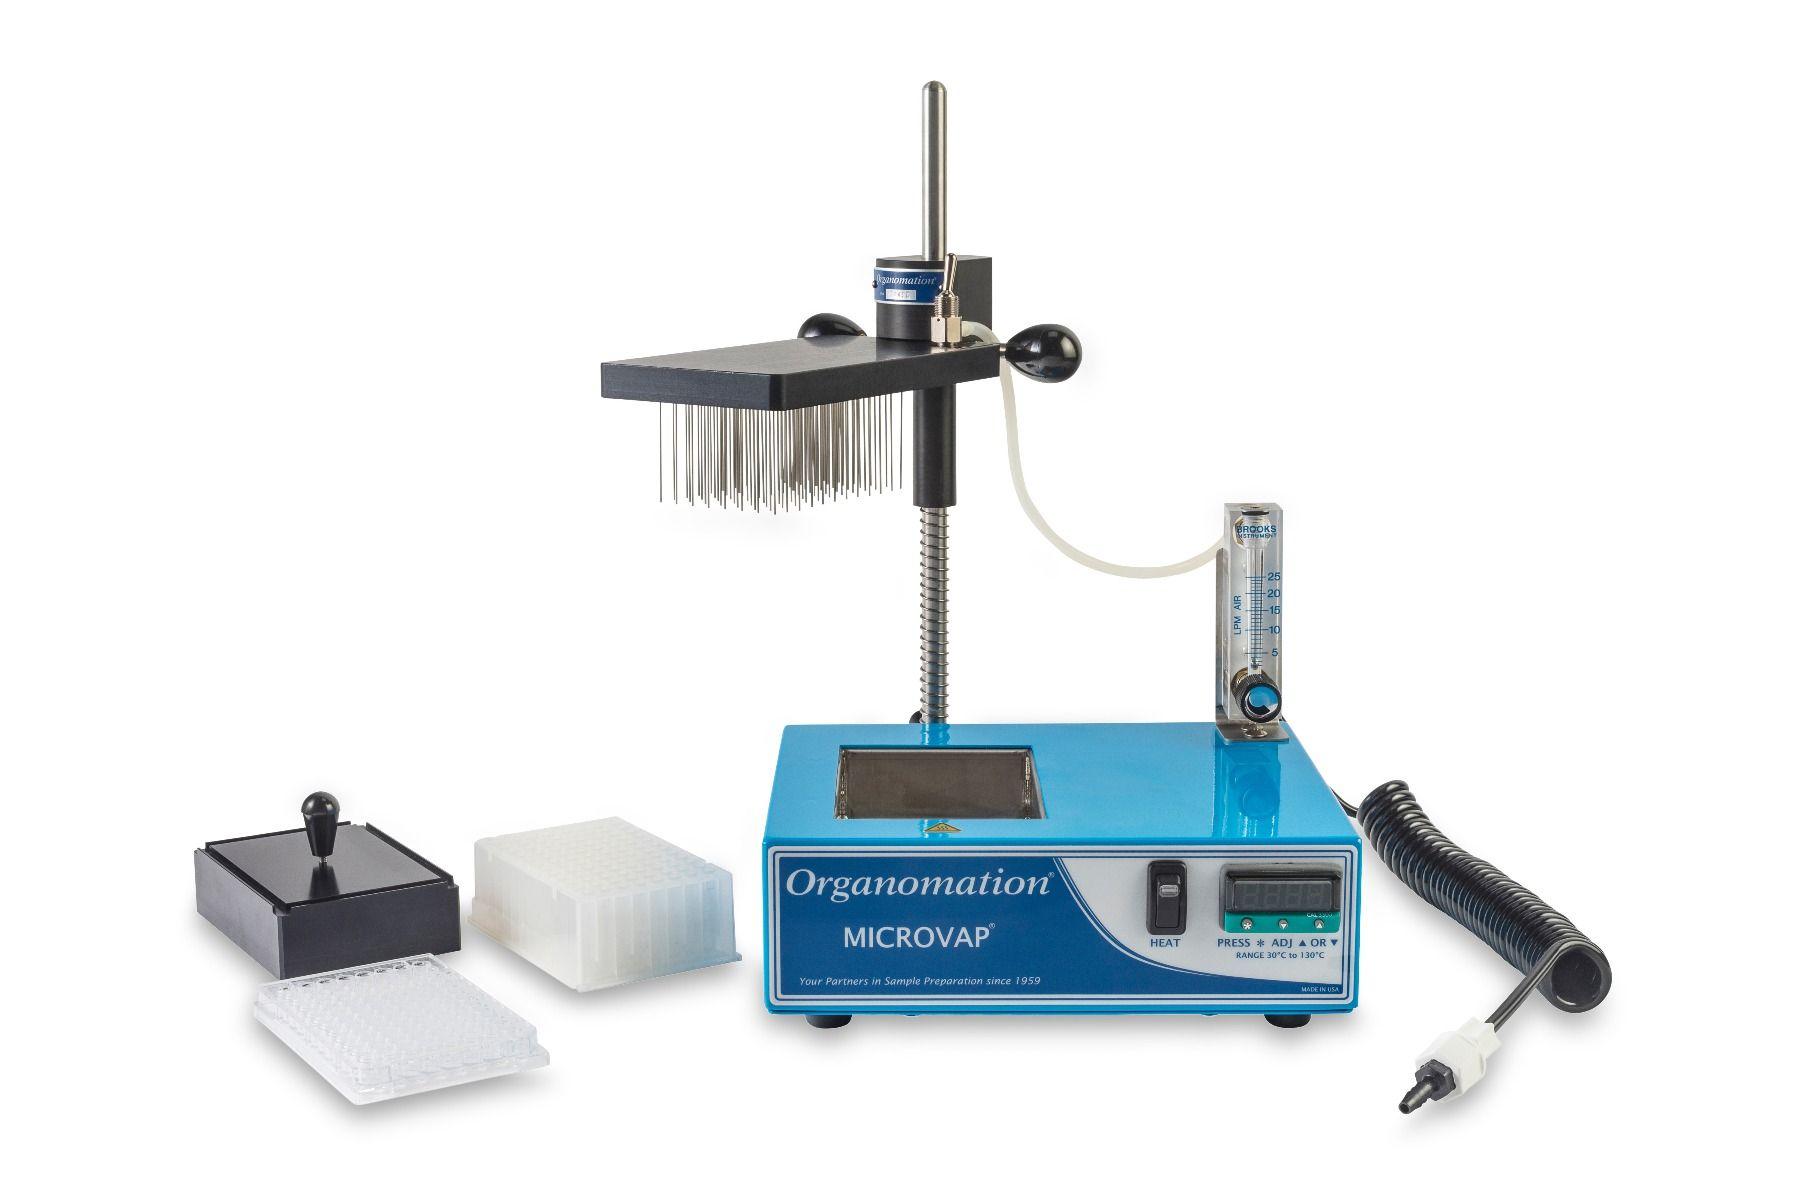 Organomation Single Plate MICROVAP® nitrogen evaporator